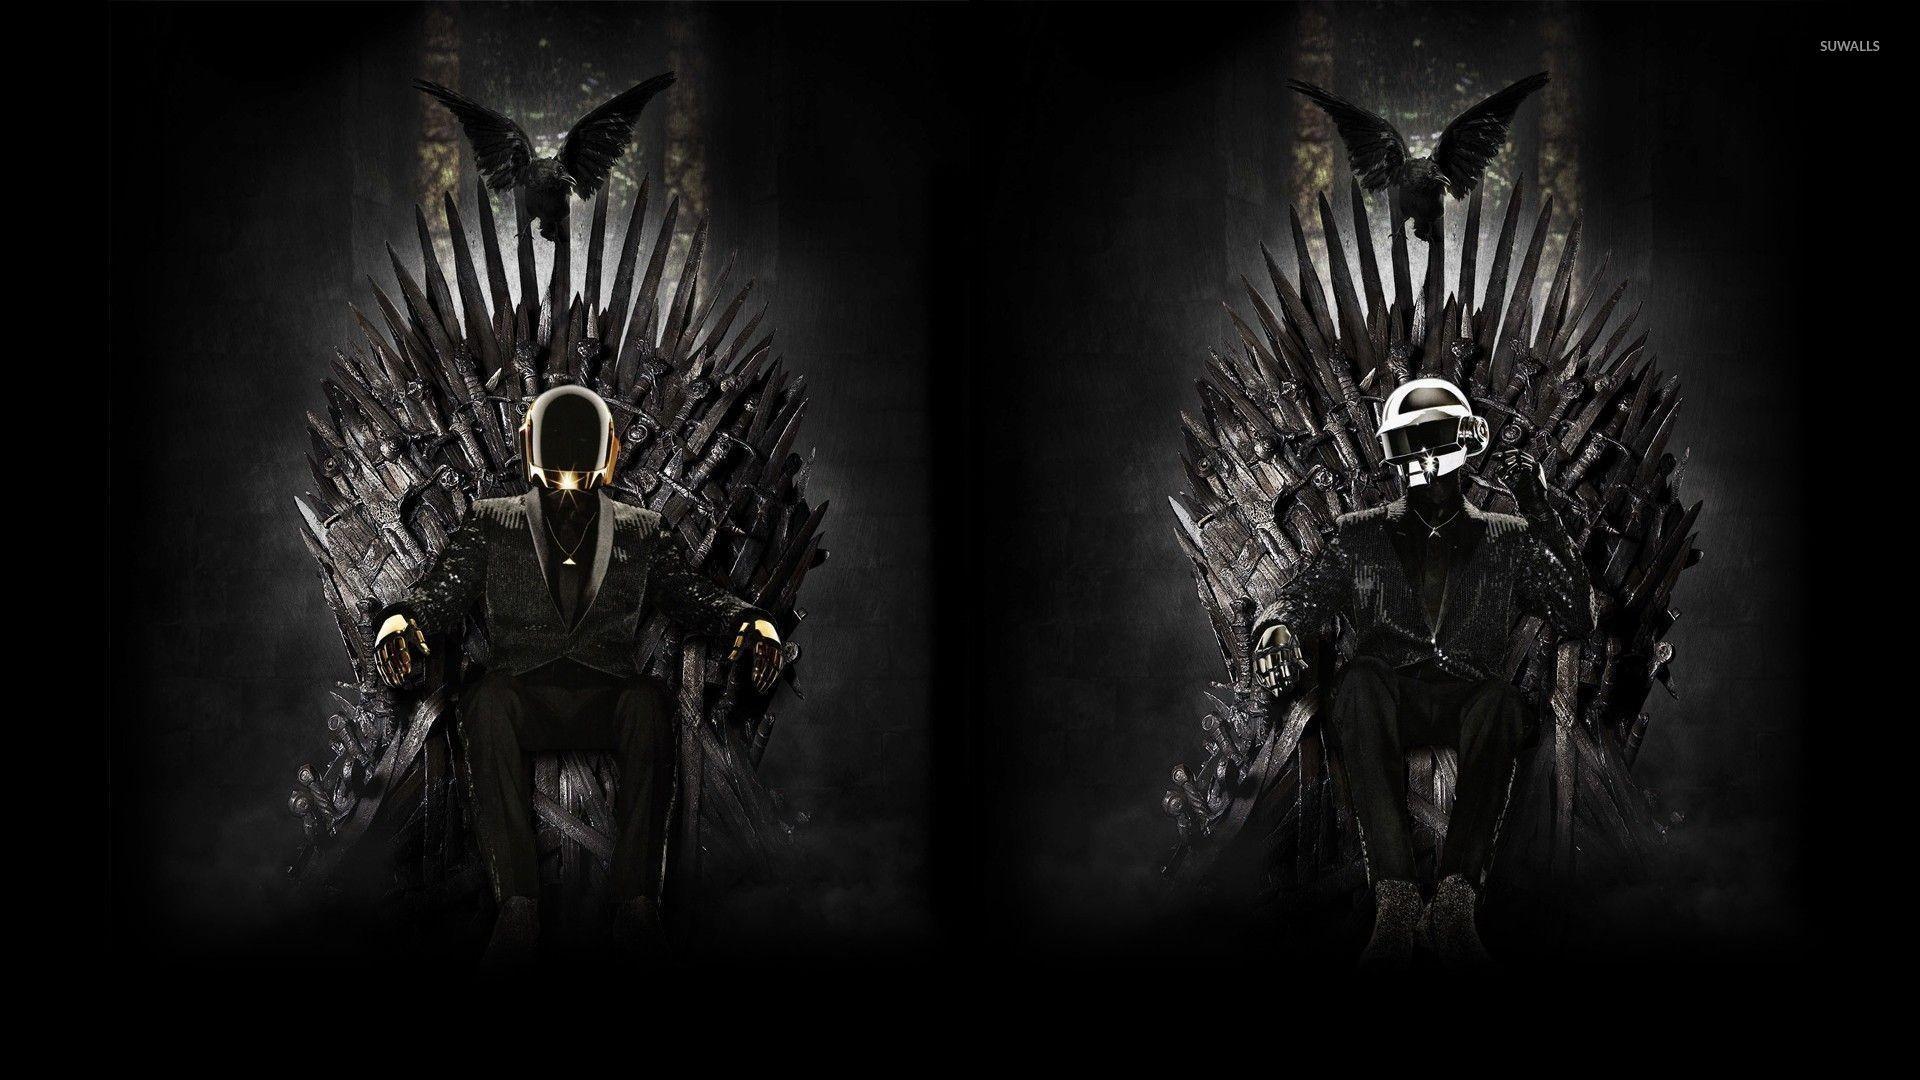 Daft Punk on the Iron Throne wallpaper jpg